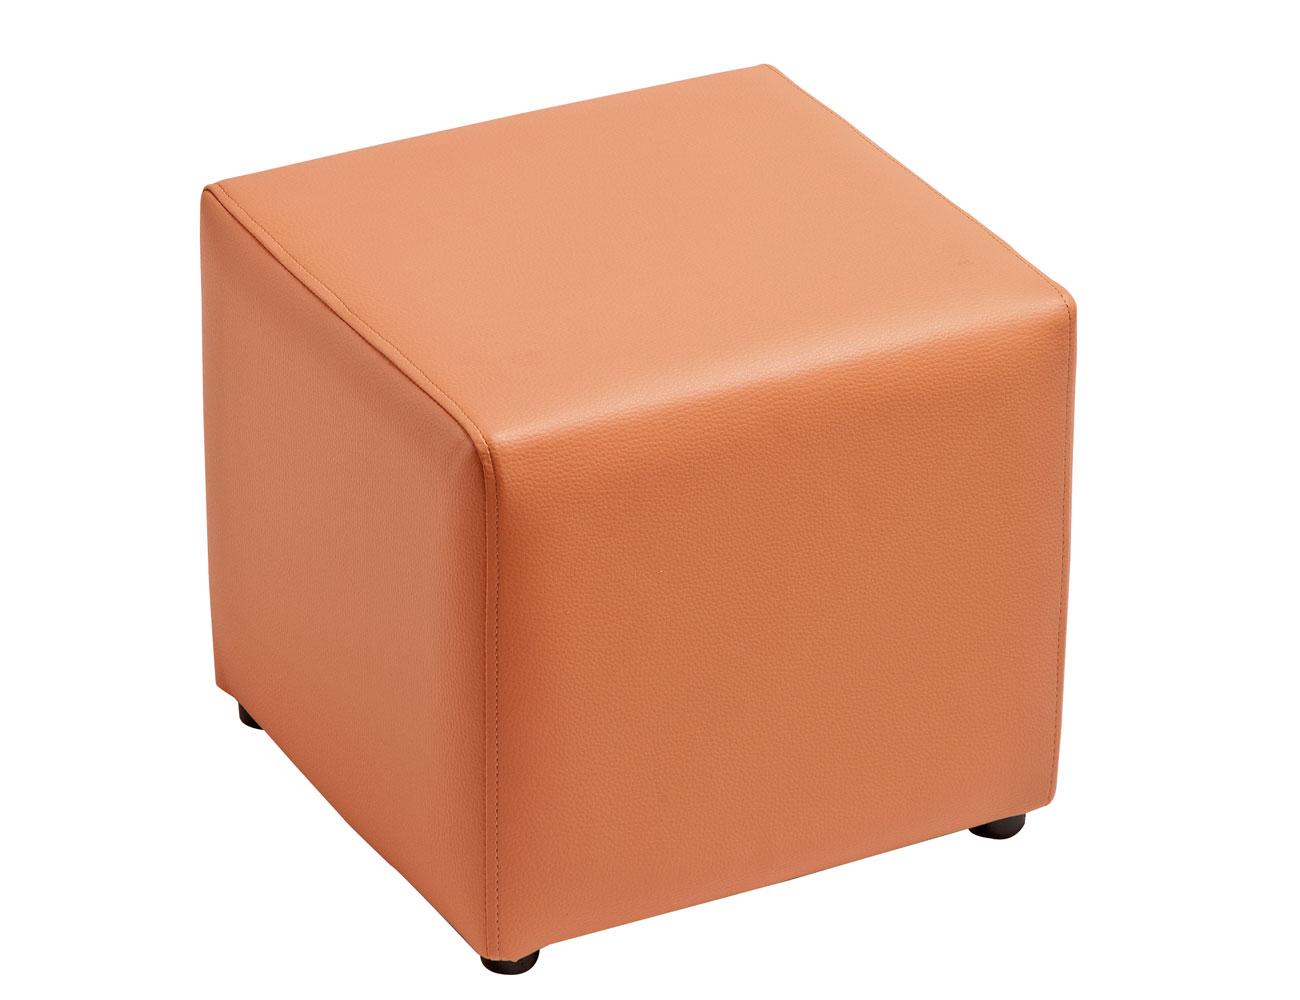 4 cuadrado fijo naranja3